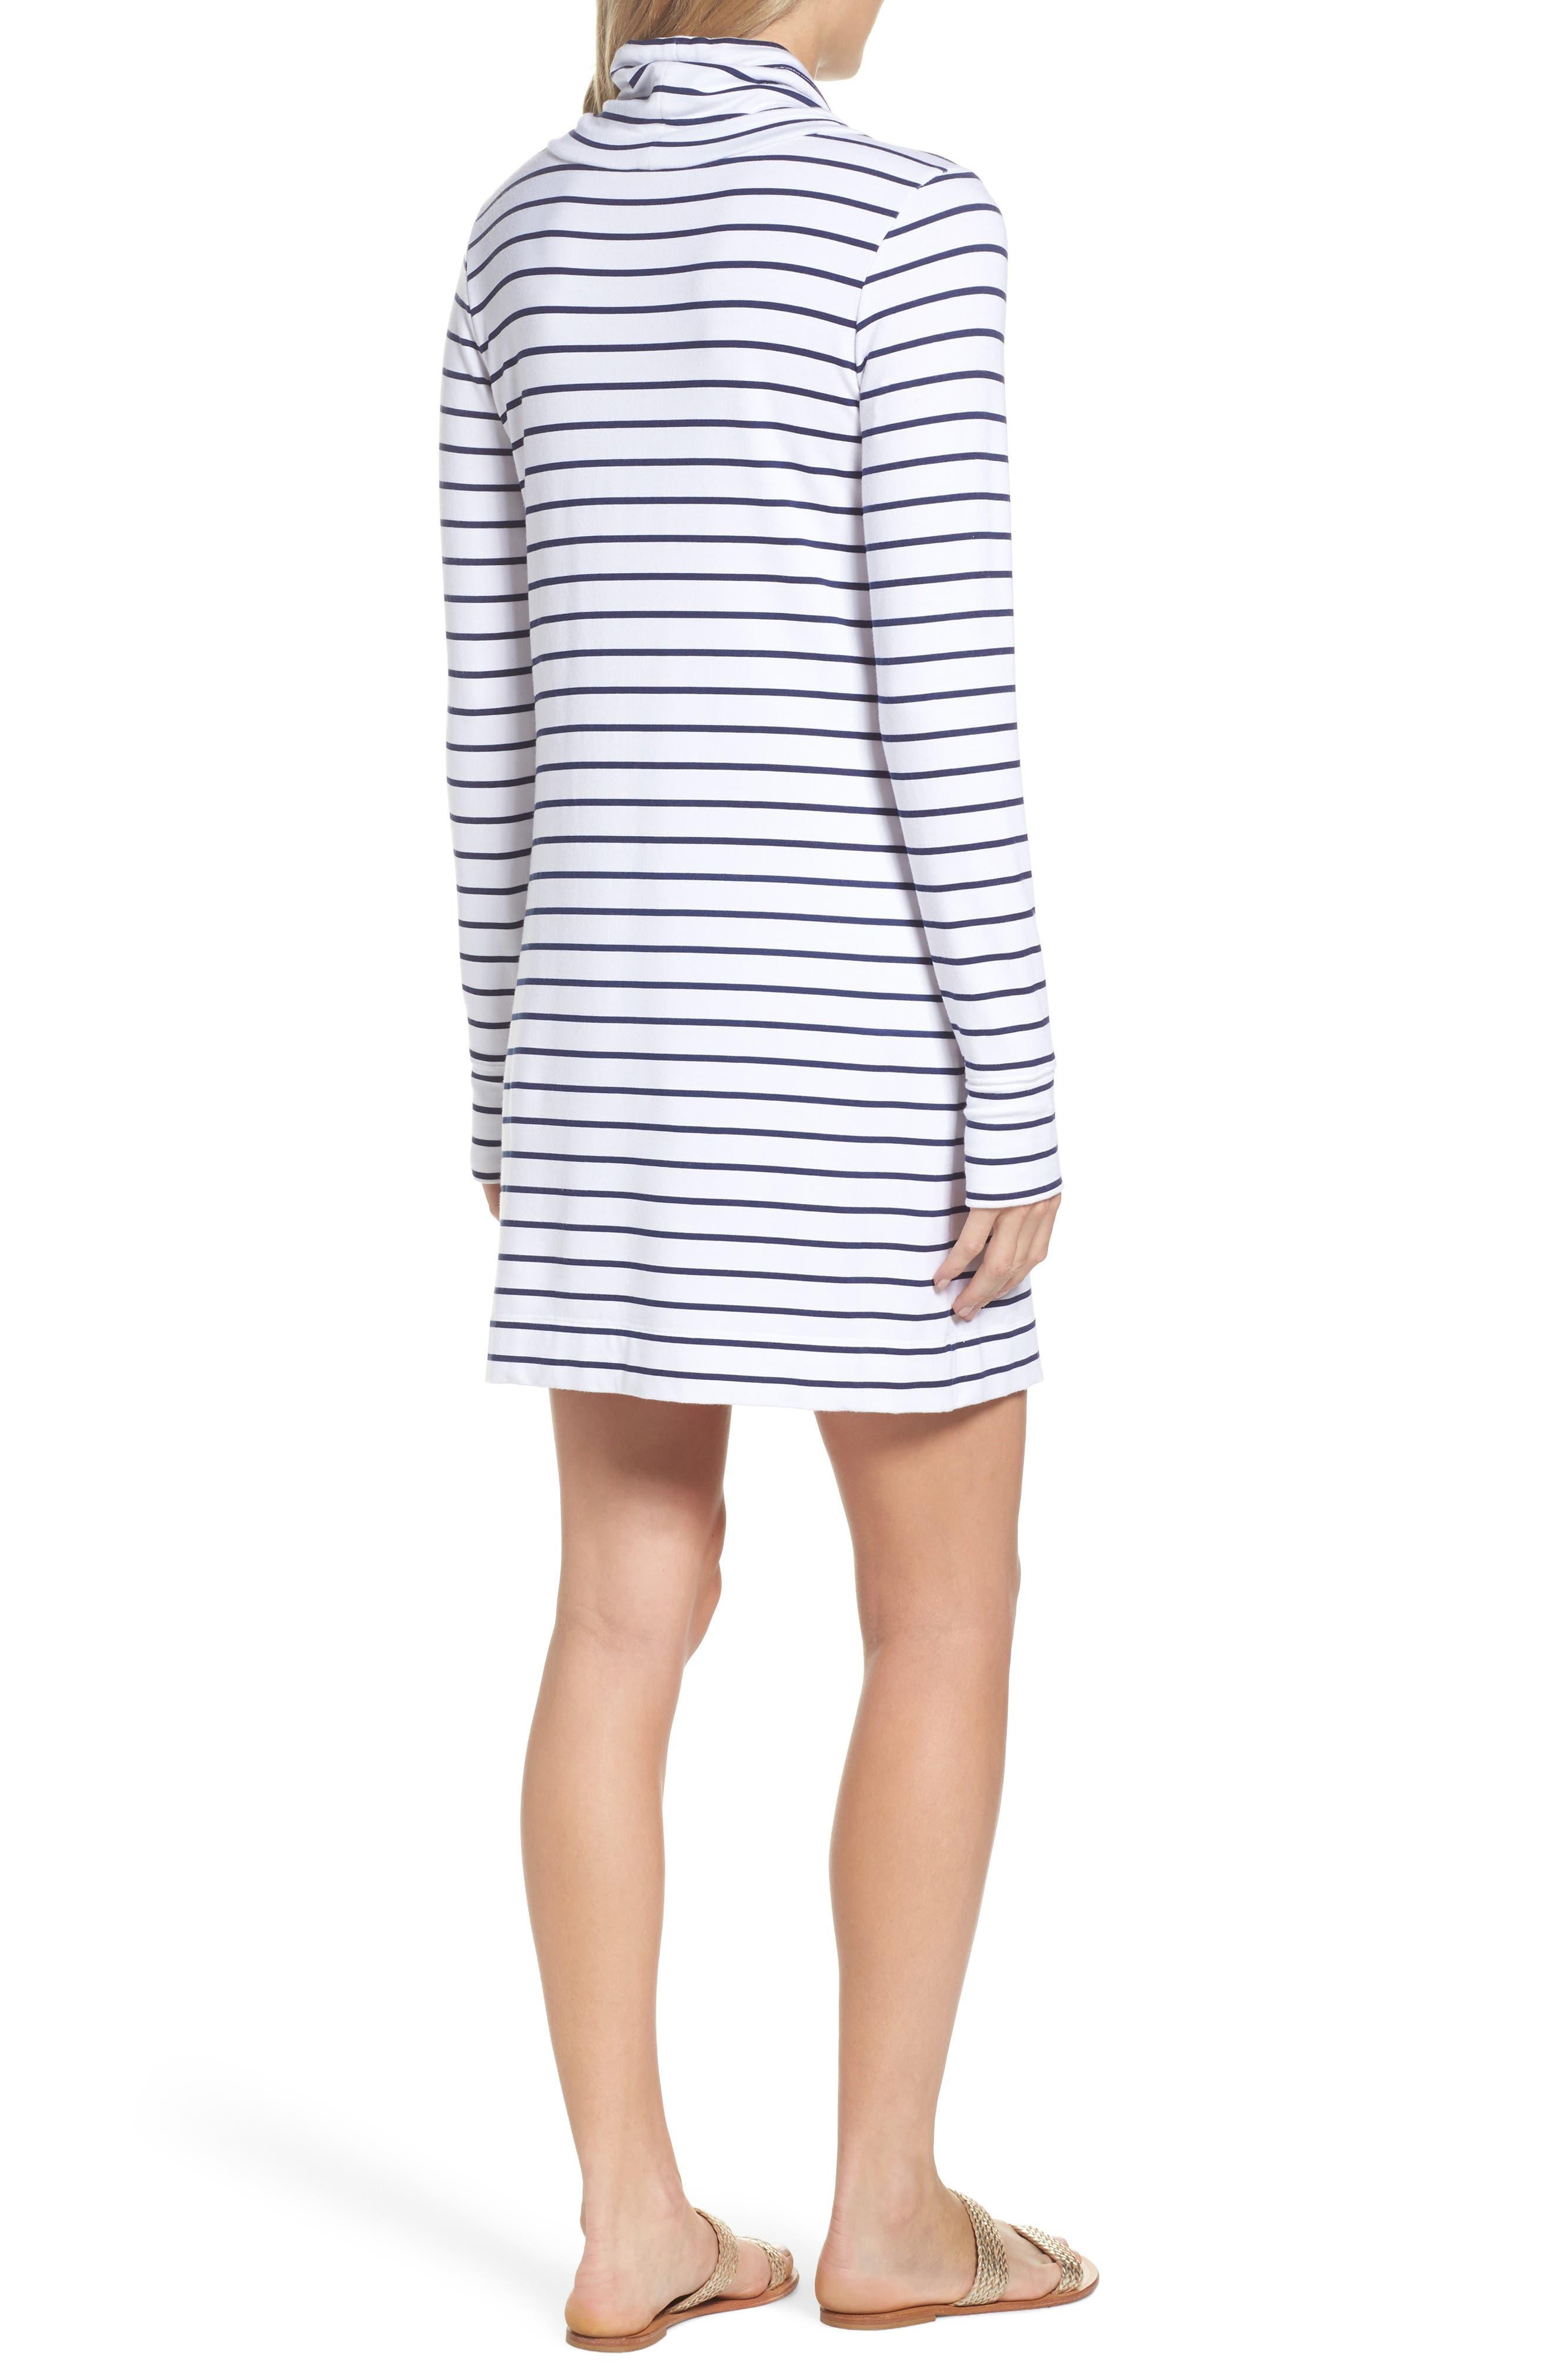 Hilary UPF 50+ Dress,                             Alternate thumbnail 2, color,